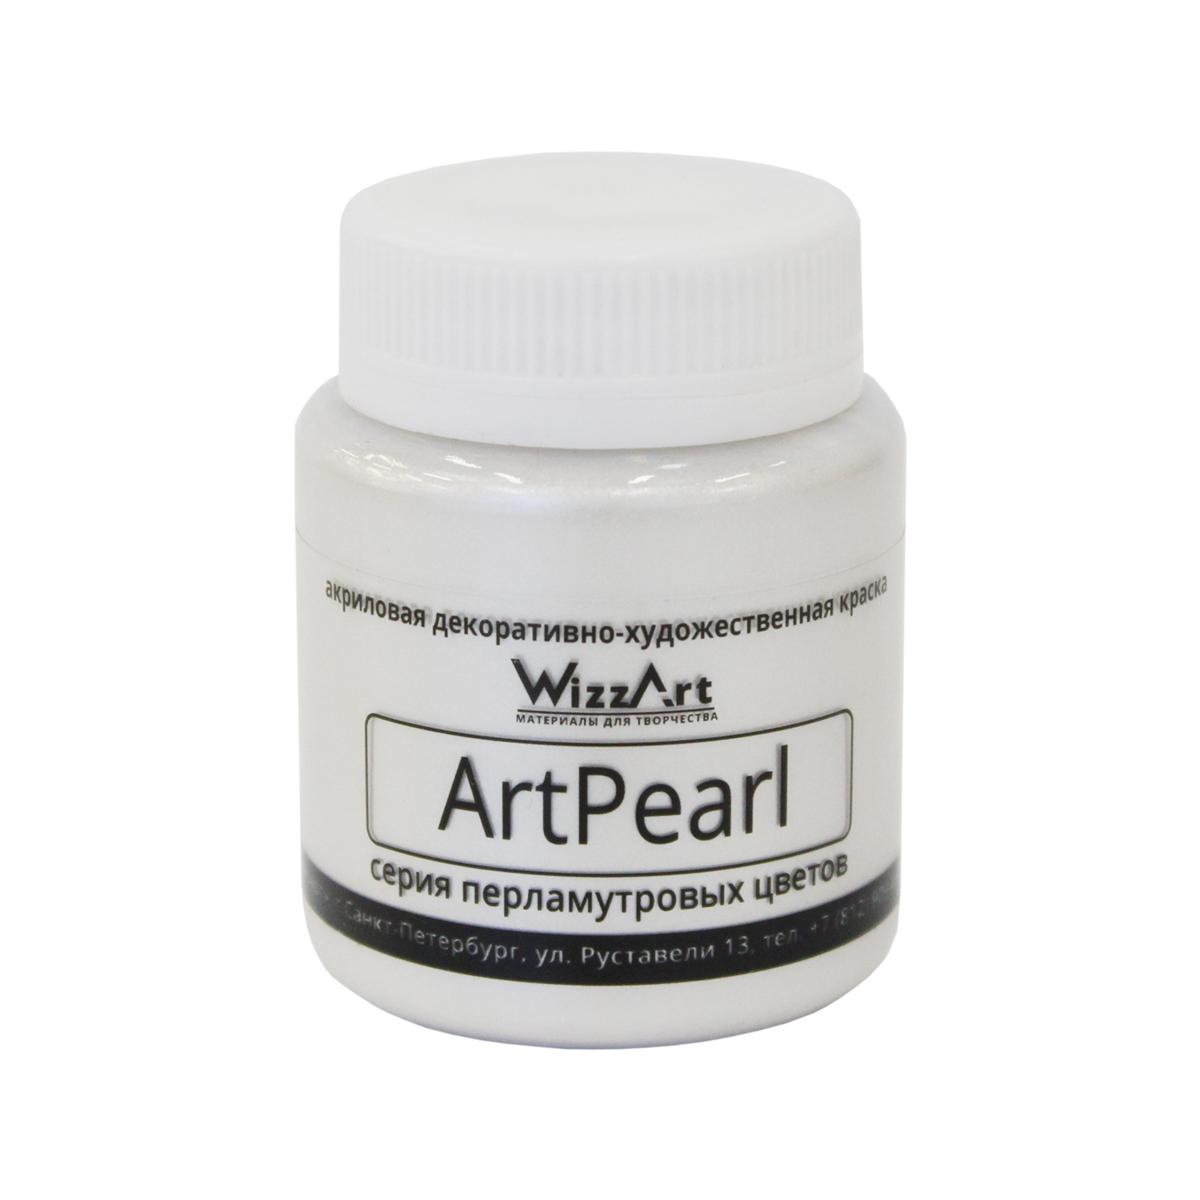 Краска акриловая Wizzart ArtPearl, цвет: белый, 80 мл501038